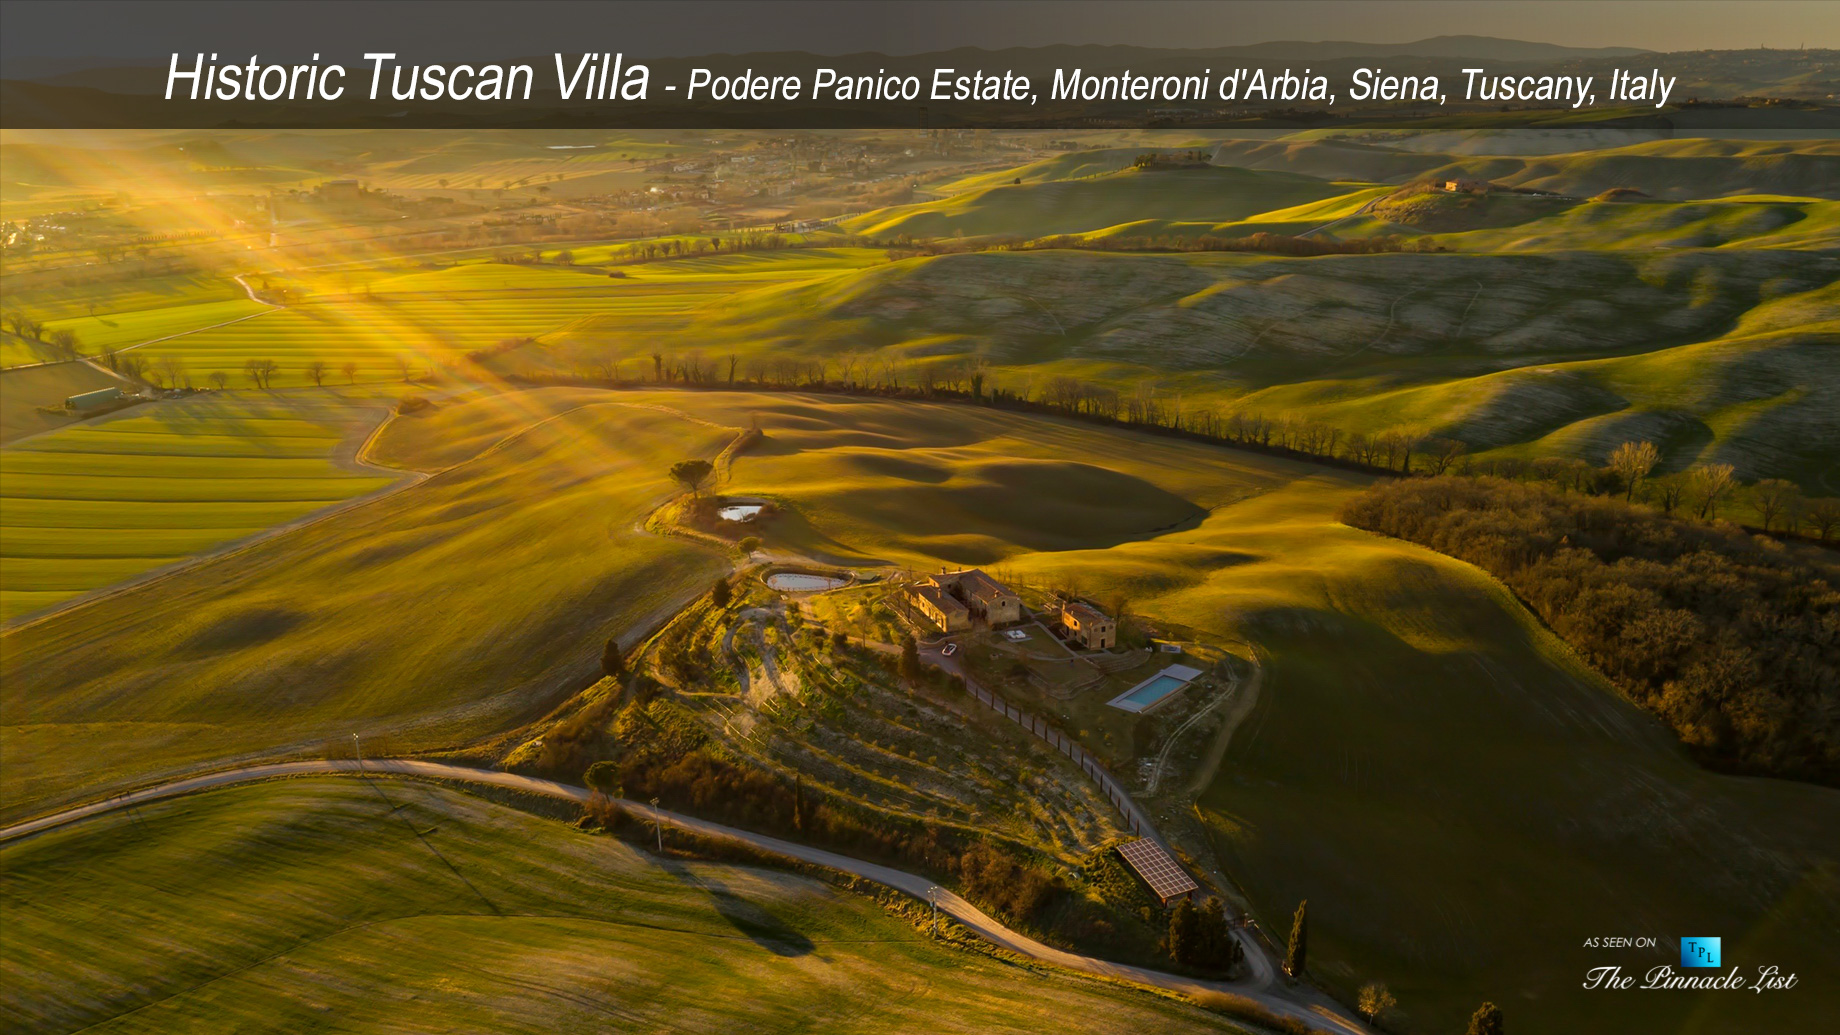 Historic Tuscan Villa - Podere Panico Estate, Monteroni d'Arbia, Siena, Tuscany, Italy